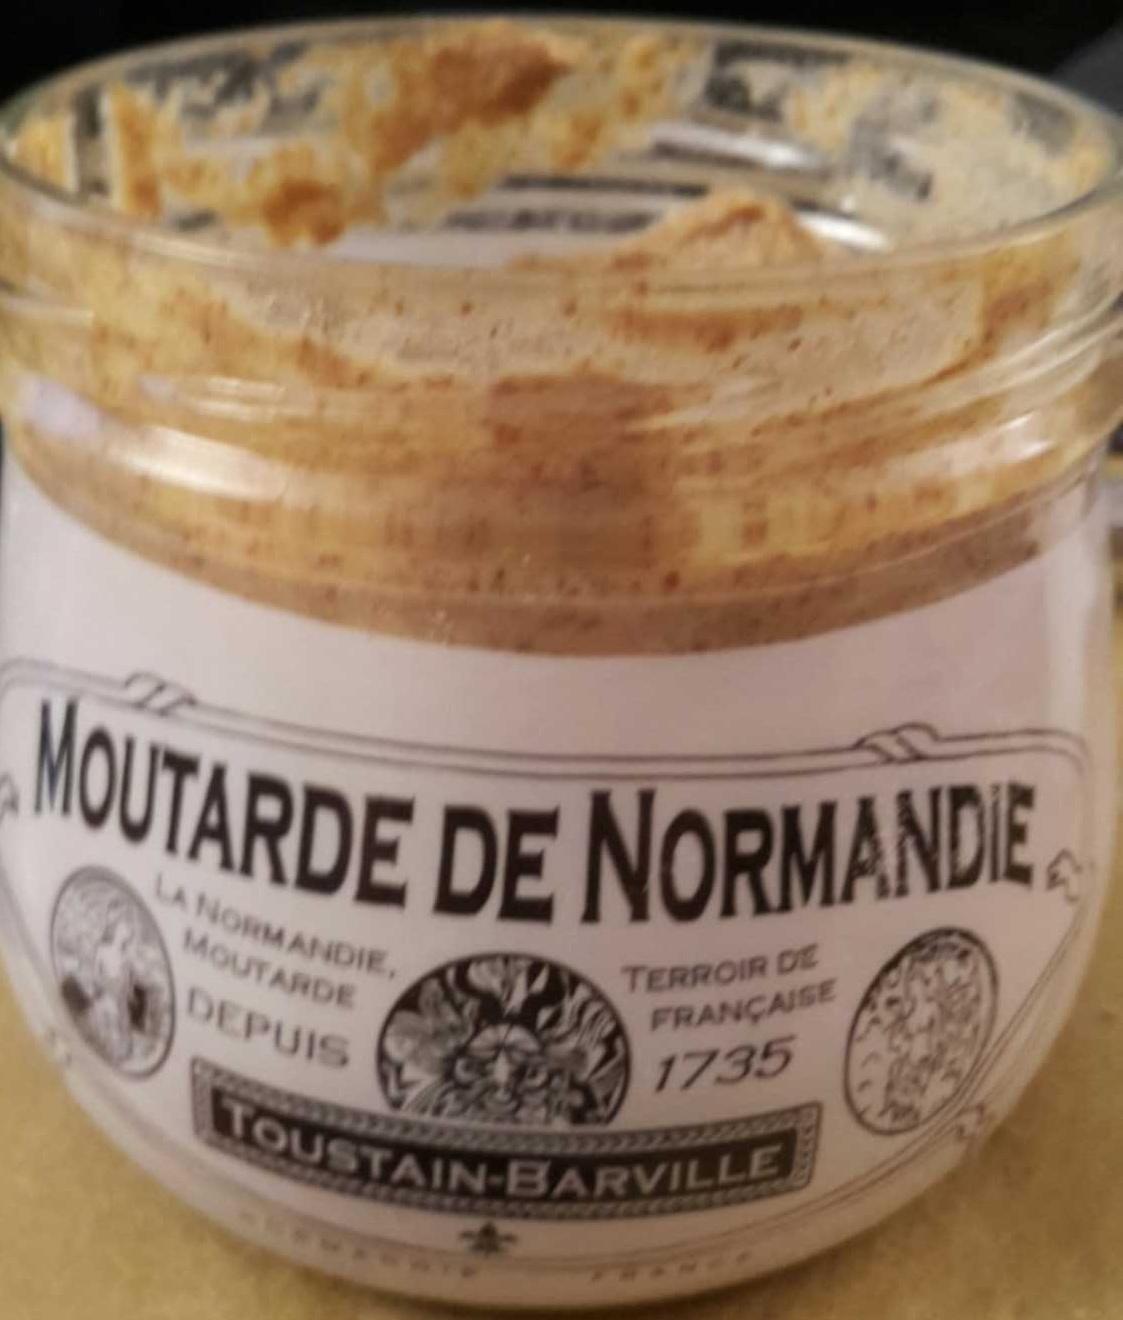 Moutarde de Normandie - Product - fr